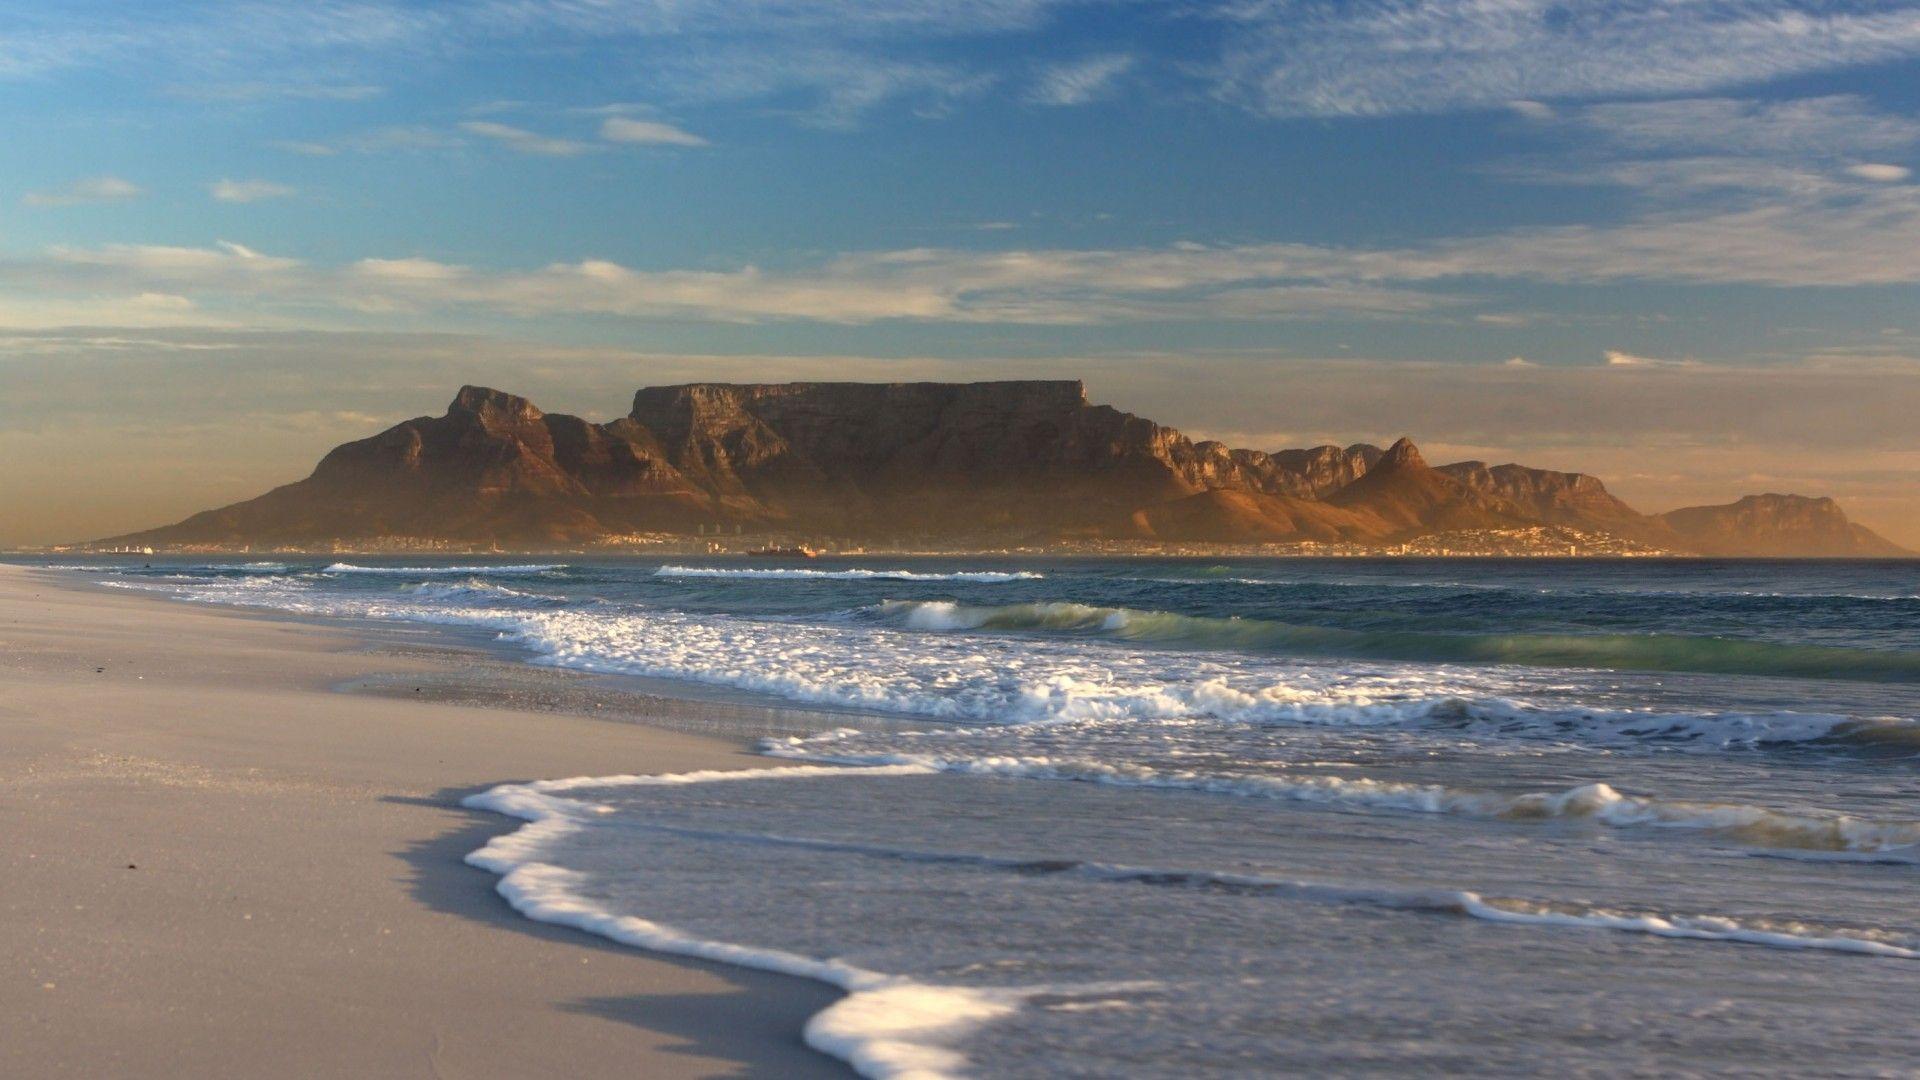 Table Mountain South Africa Wallpaper 1920x1080 Hot HD Wallpaper 1920x1080